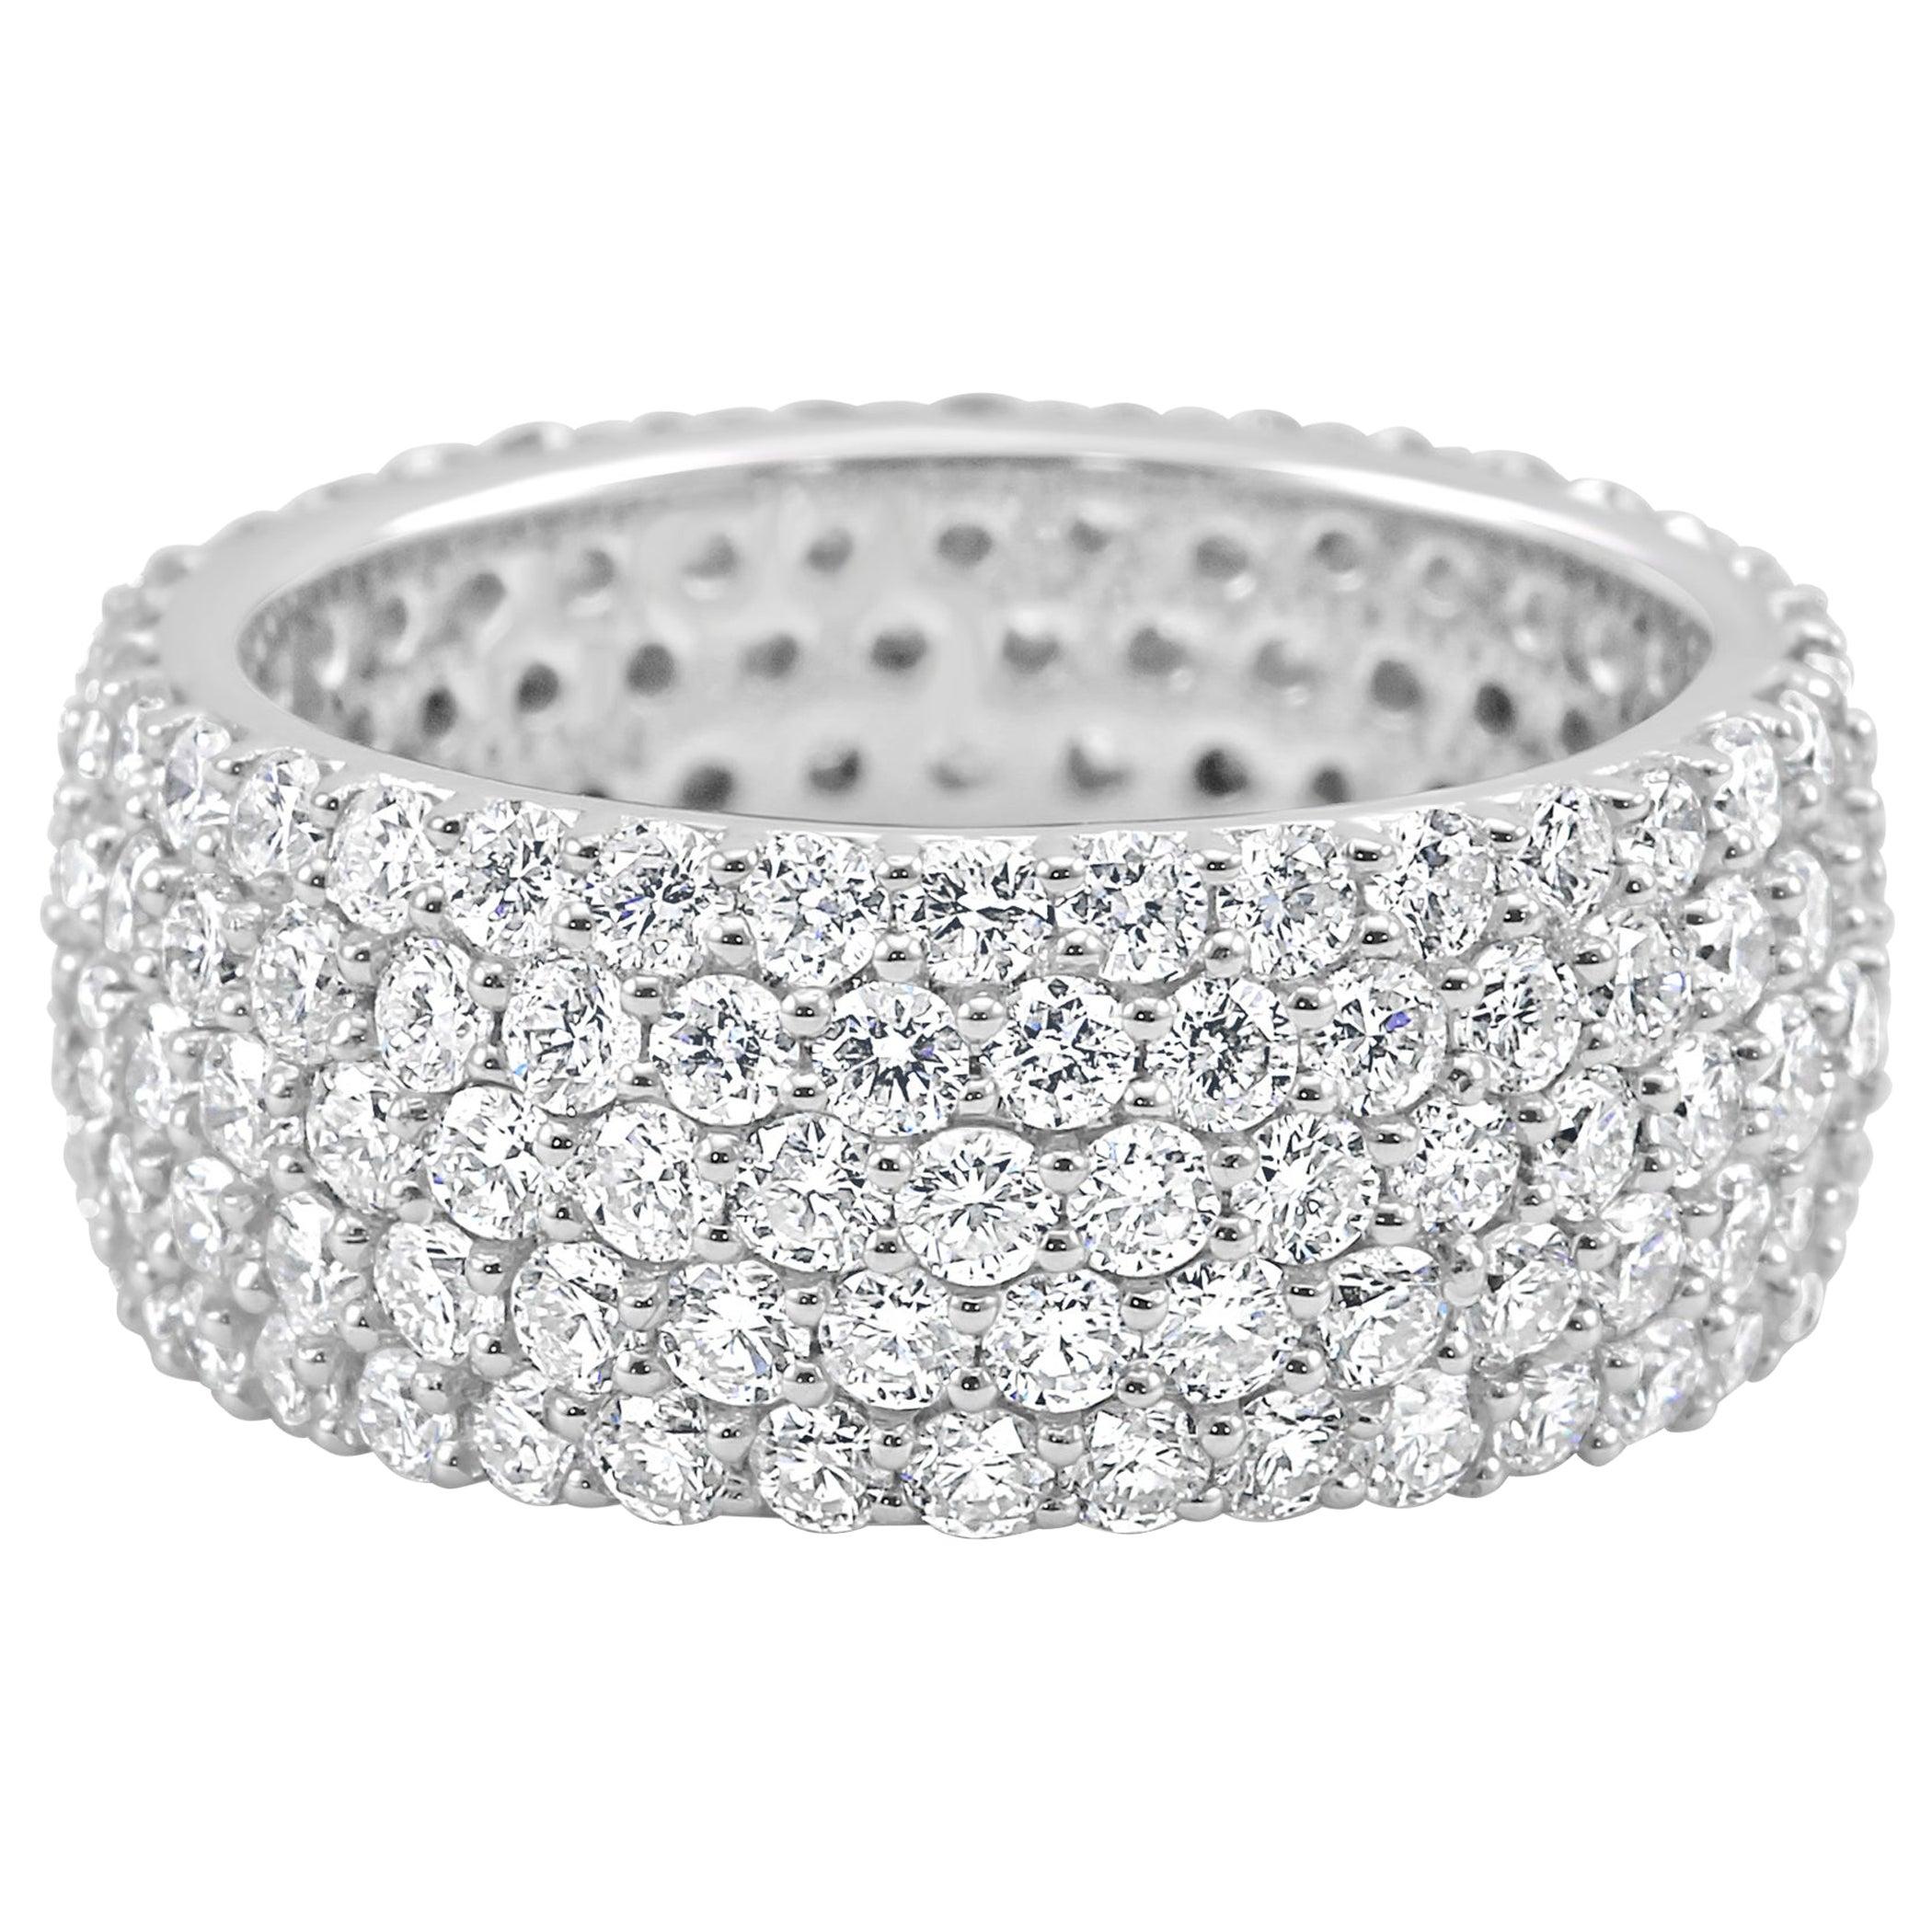 5-Row White Round Diamond 18K Gold Dome Fashion Cocktail Eternity Band Ring